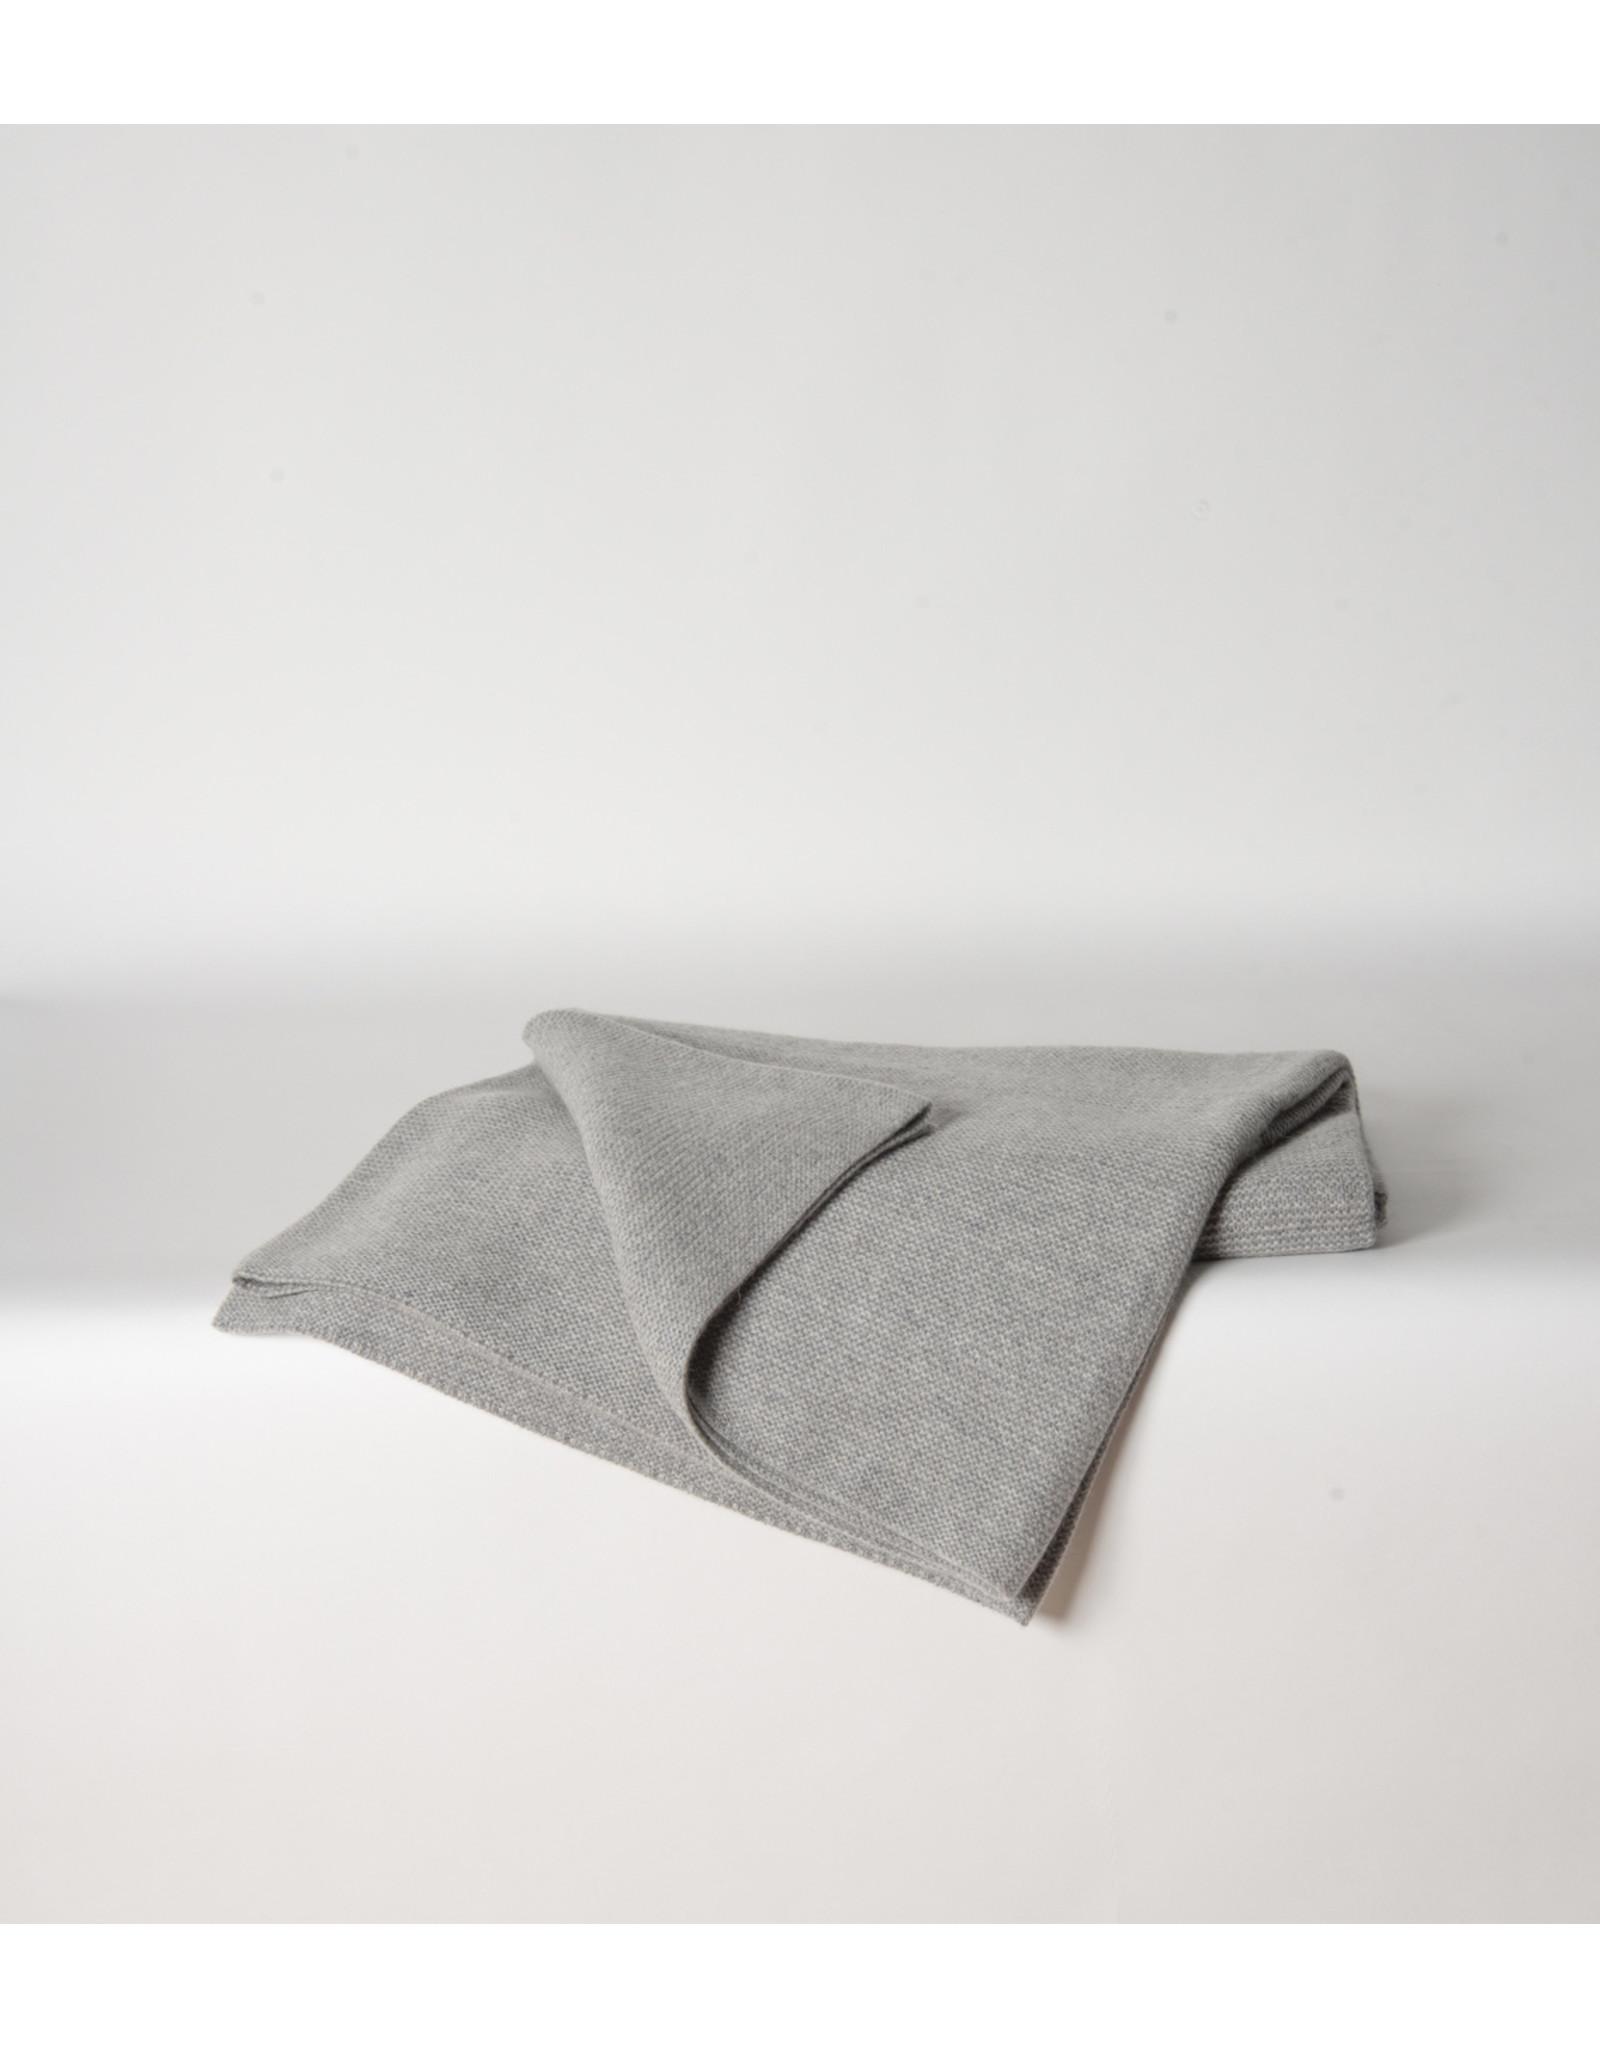 Hangai Organic Purl Knit (Color: Grey)